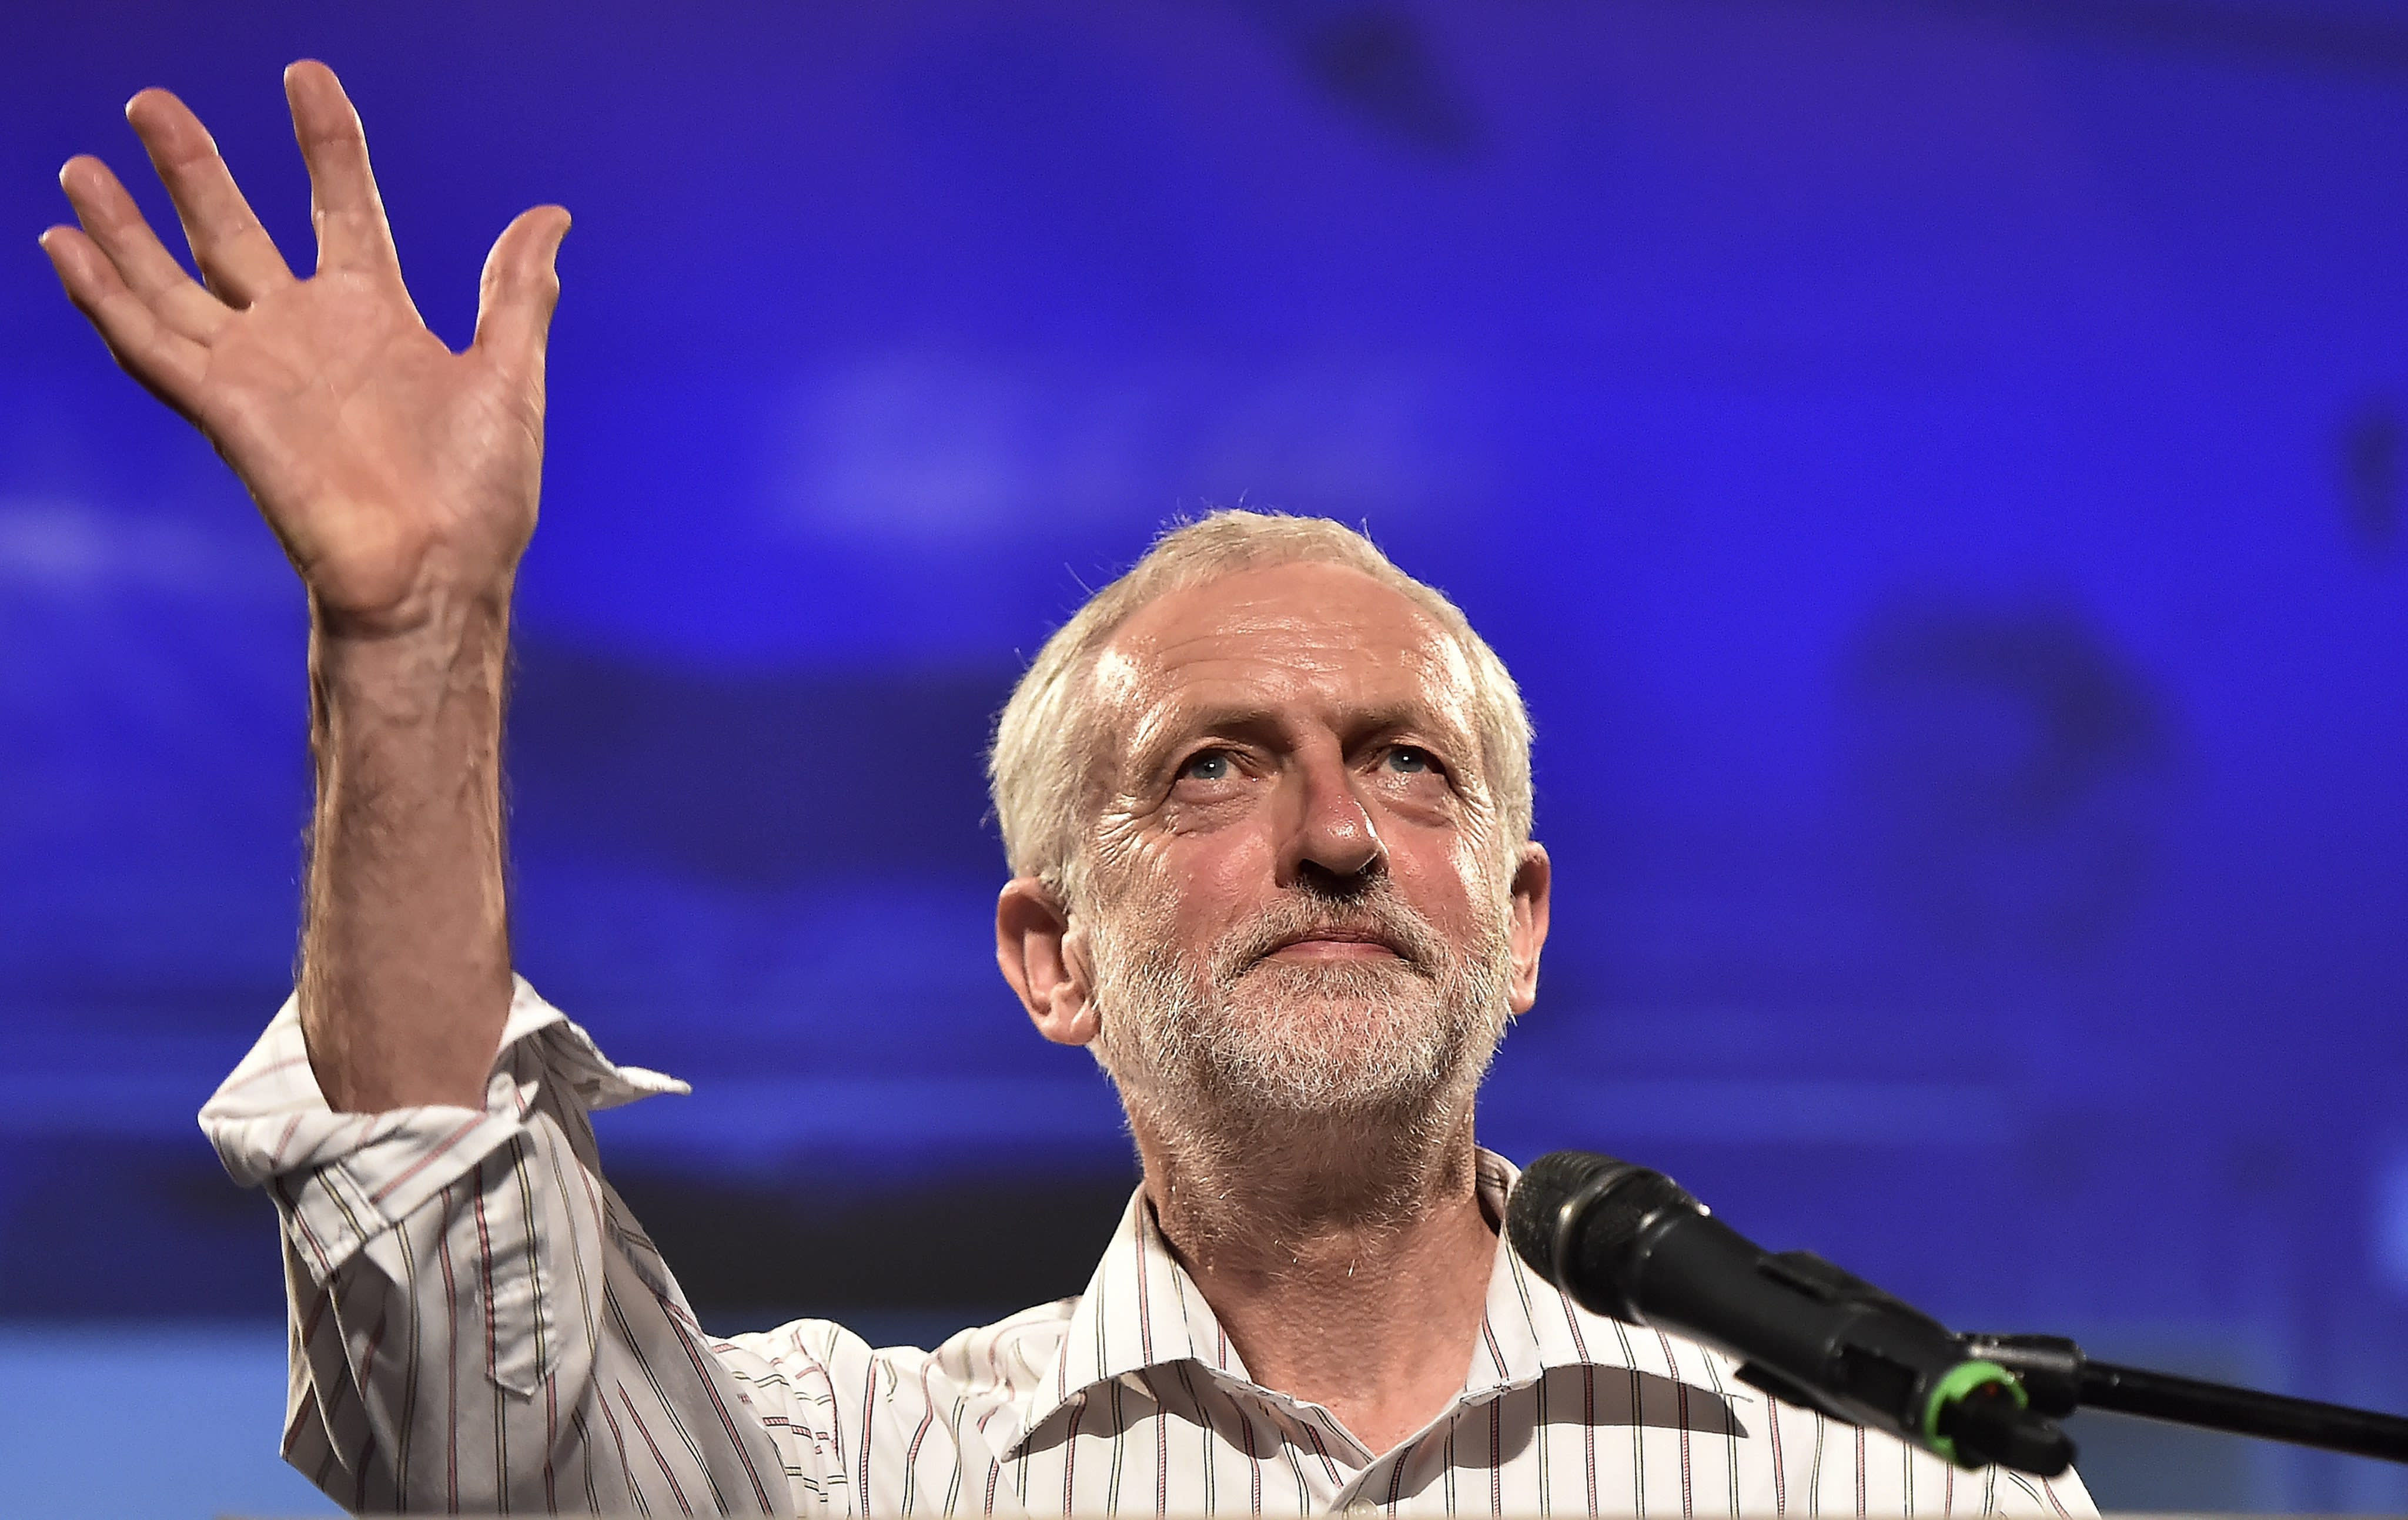 Buxton warns advisers underestimate risk of Corbyn